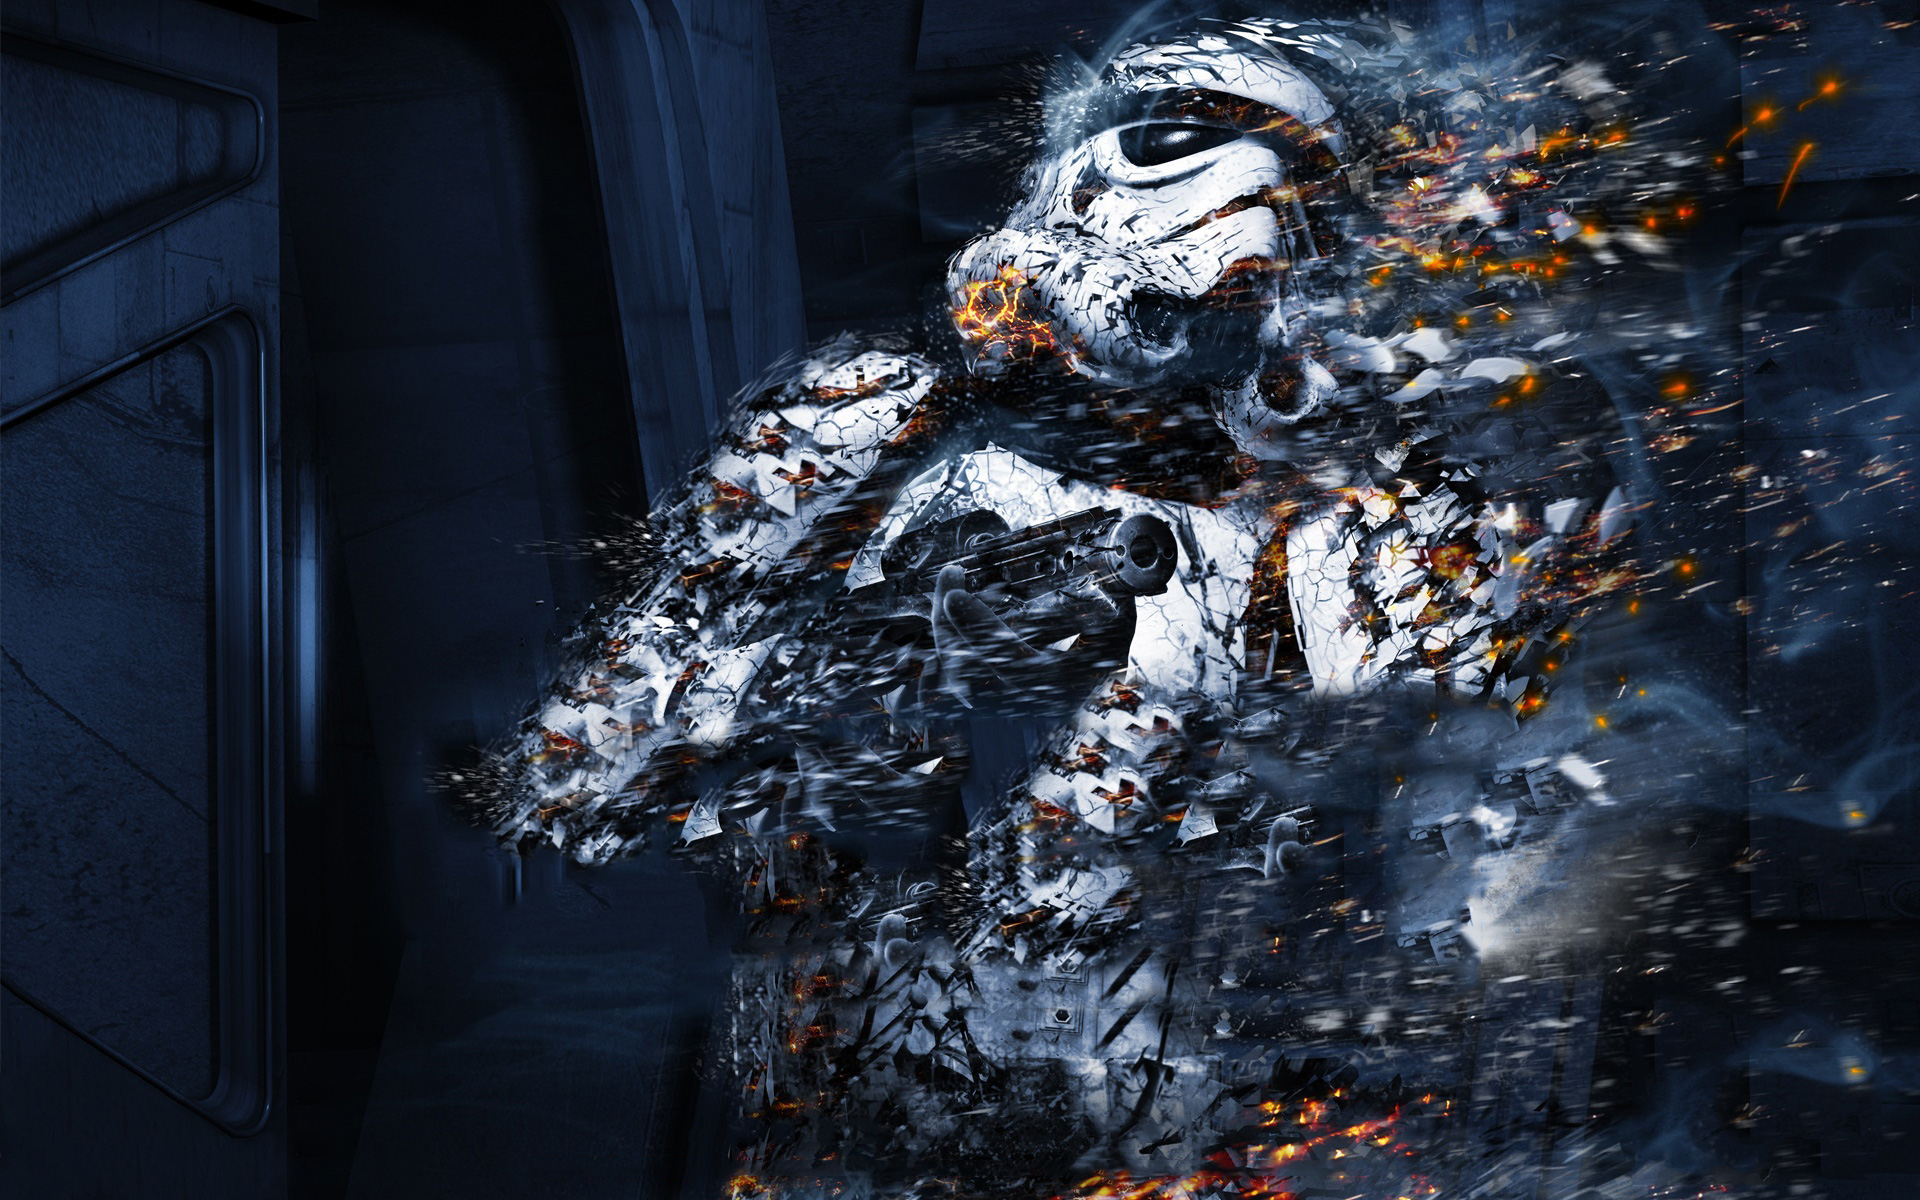 Star Wars The Force Unleashed Stormtrooper   Desktop Wallpaper 1920x1200